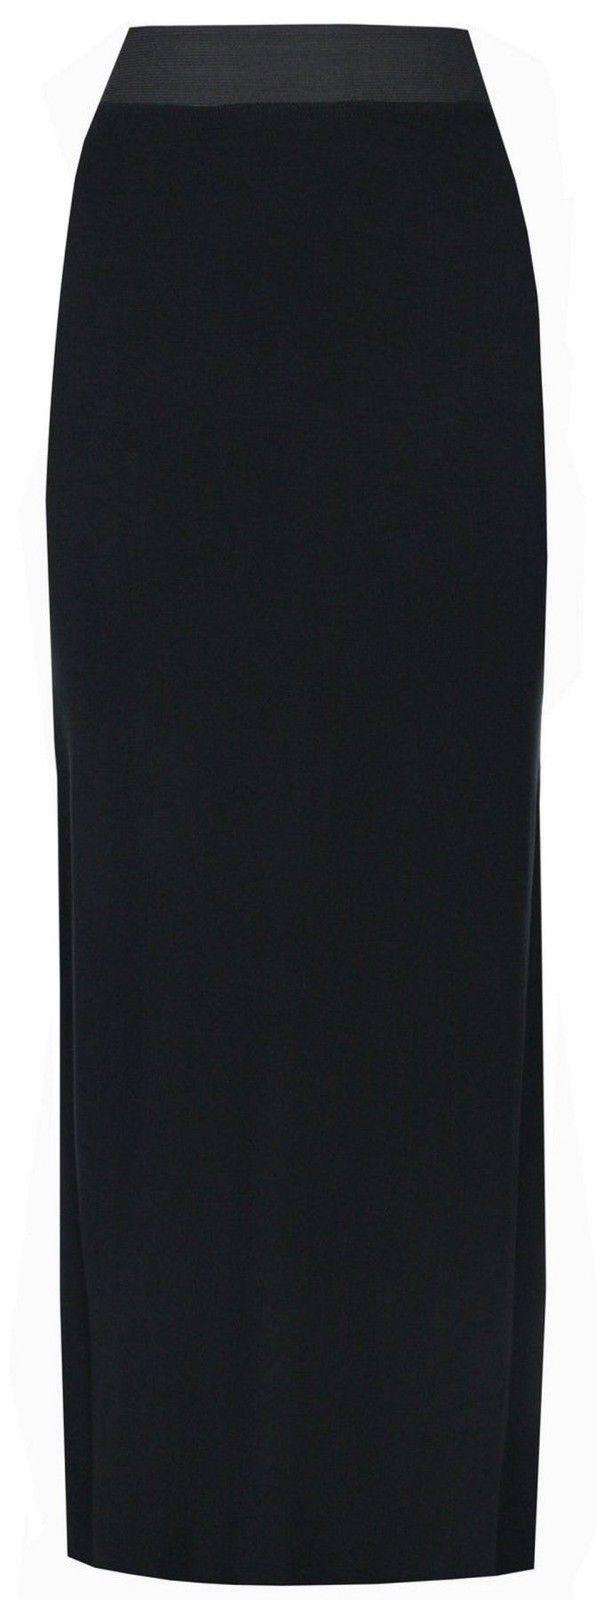 NEW WOMENS LADIES PLUS SIZE JERSEY LONG MAXI SKIRT GYPSY STRETCHY DRESS UK 16-26